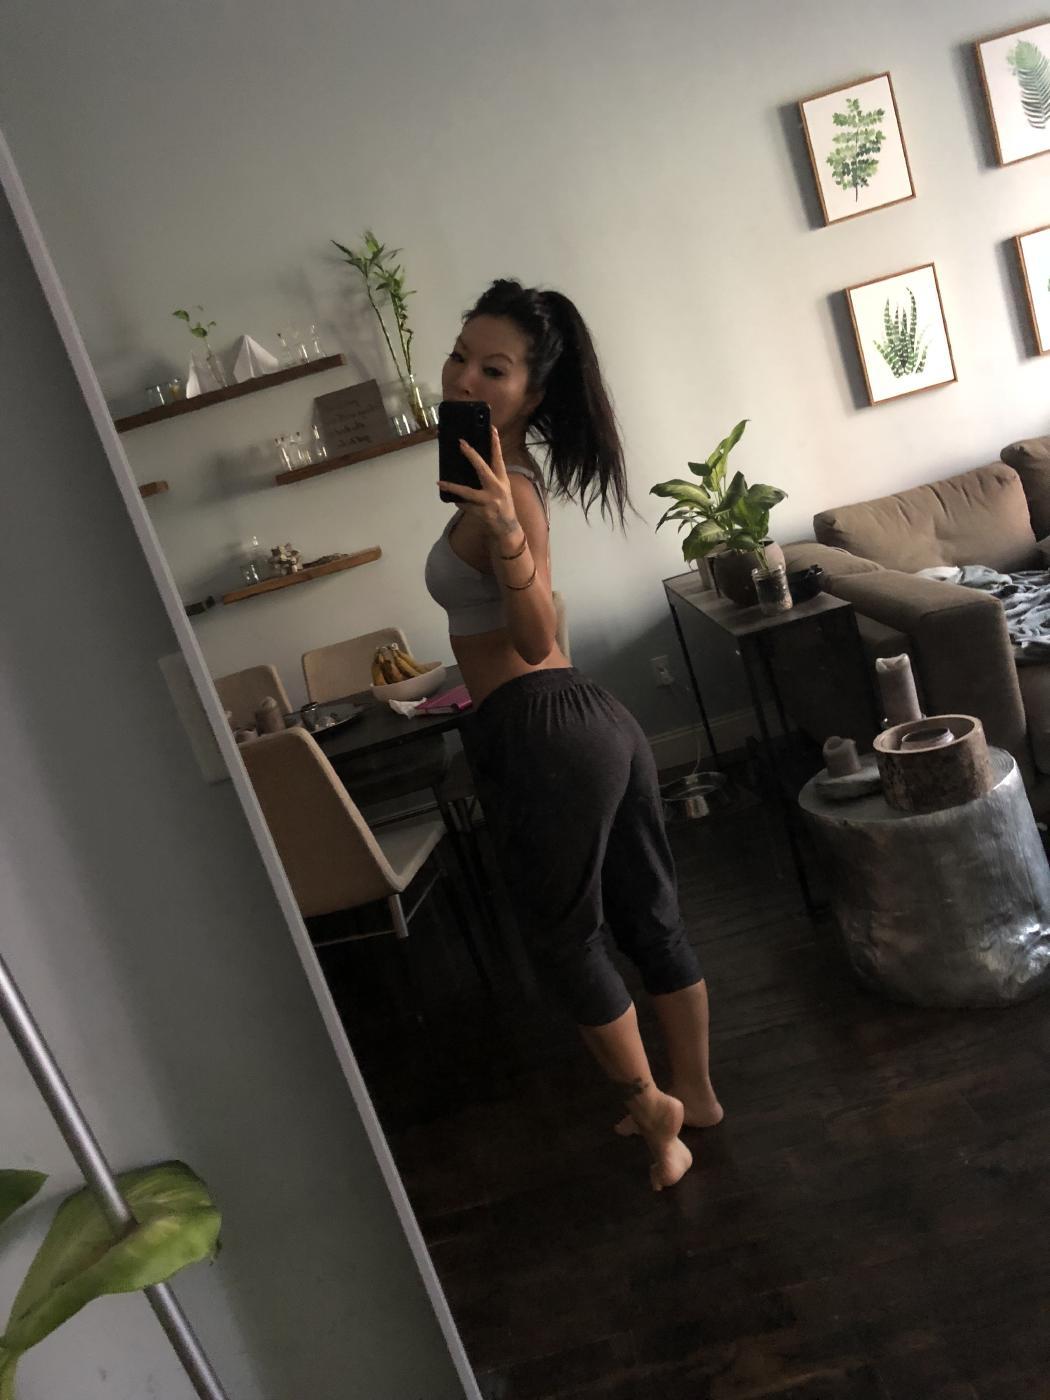 Asa Akira Nude Selfies Onlyfans Set Leaked Pivxxi